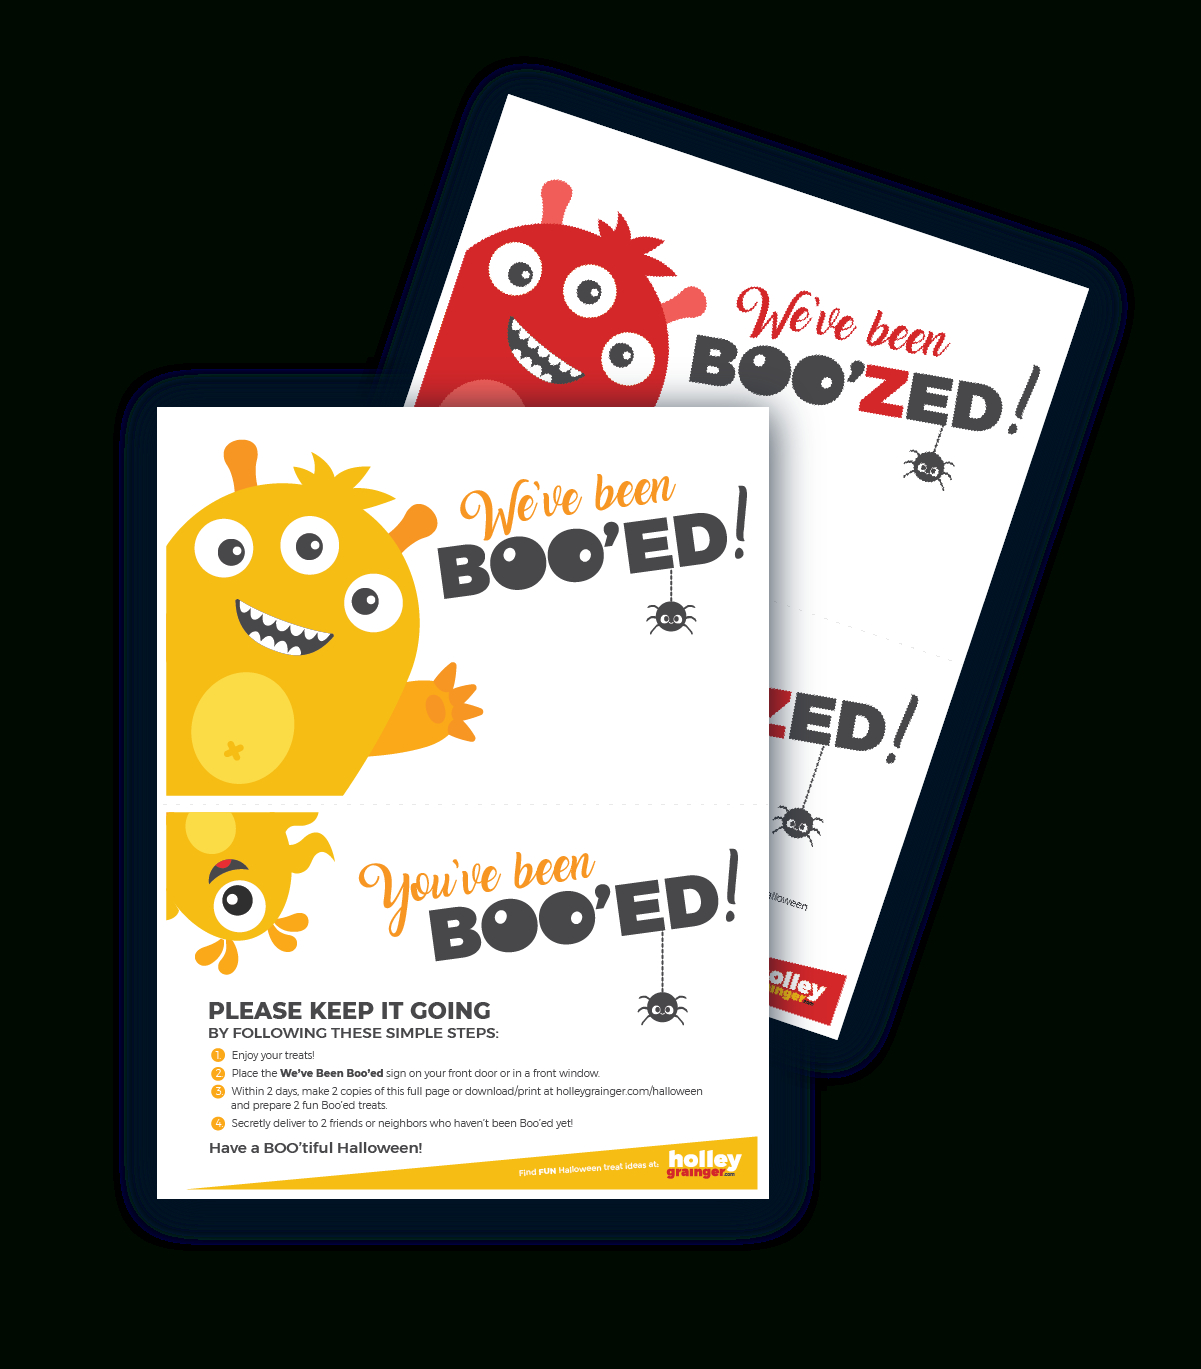 You've Been Boo'zed! Free Halloween Printable | Holley Grainger - You Ve Been Boozed Free Printable